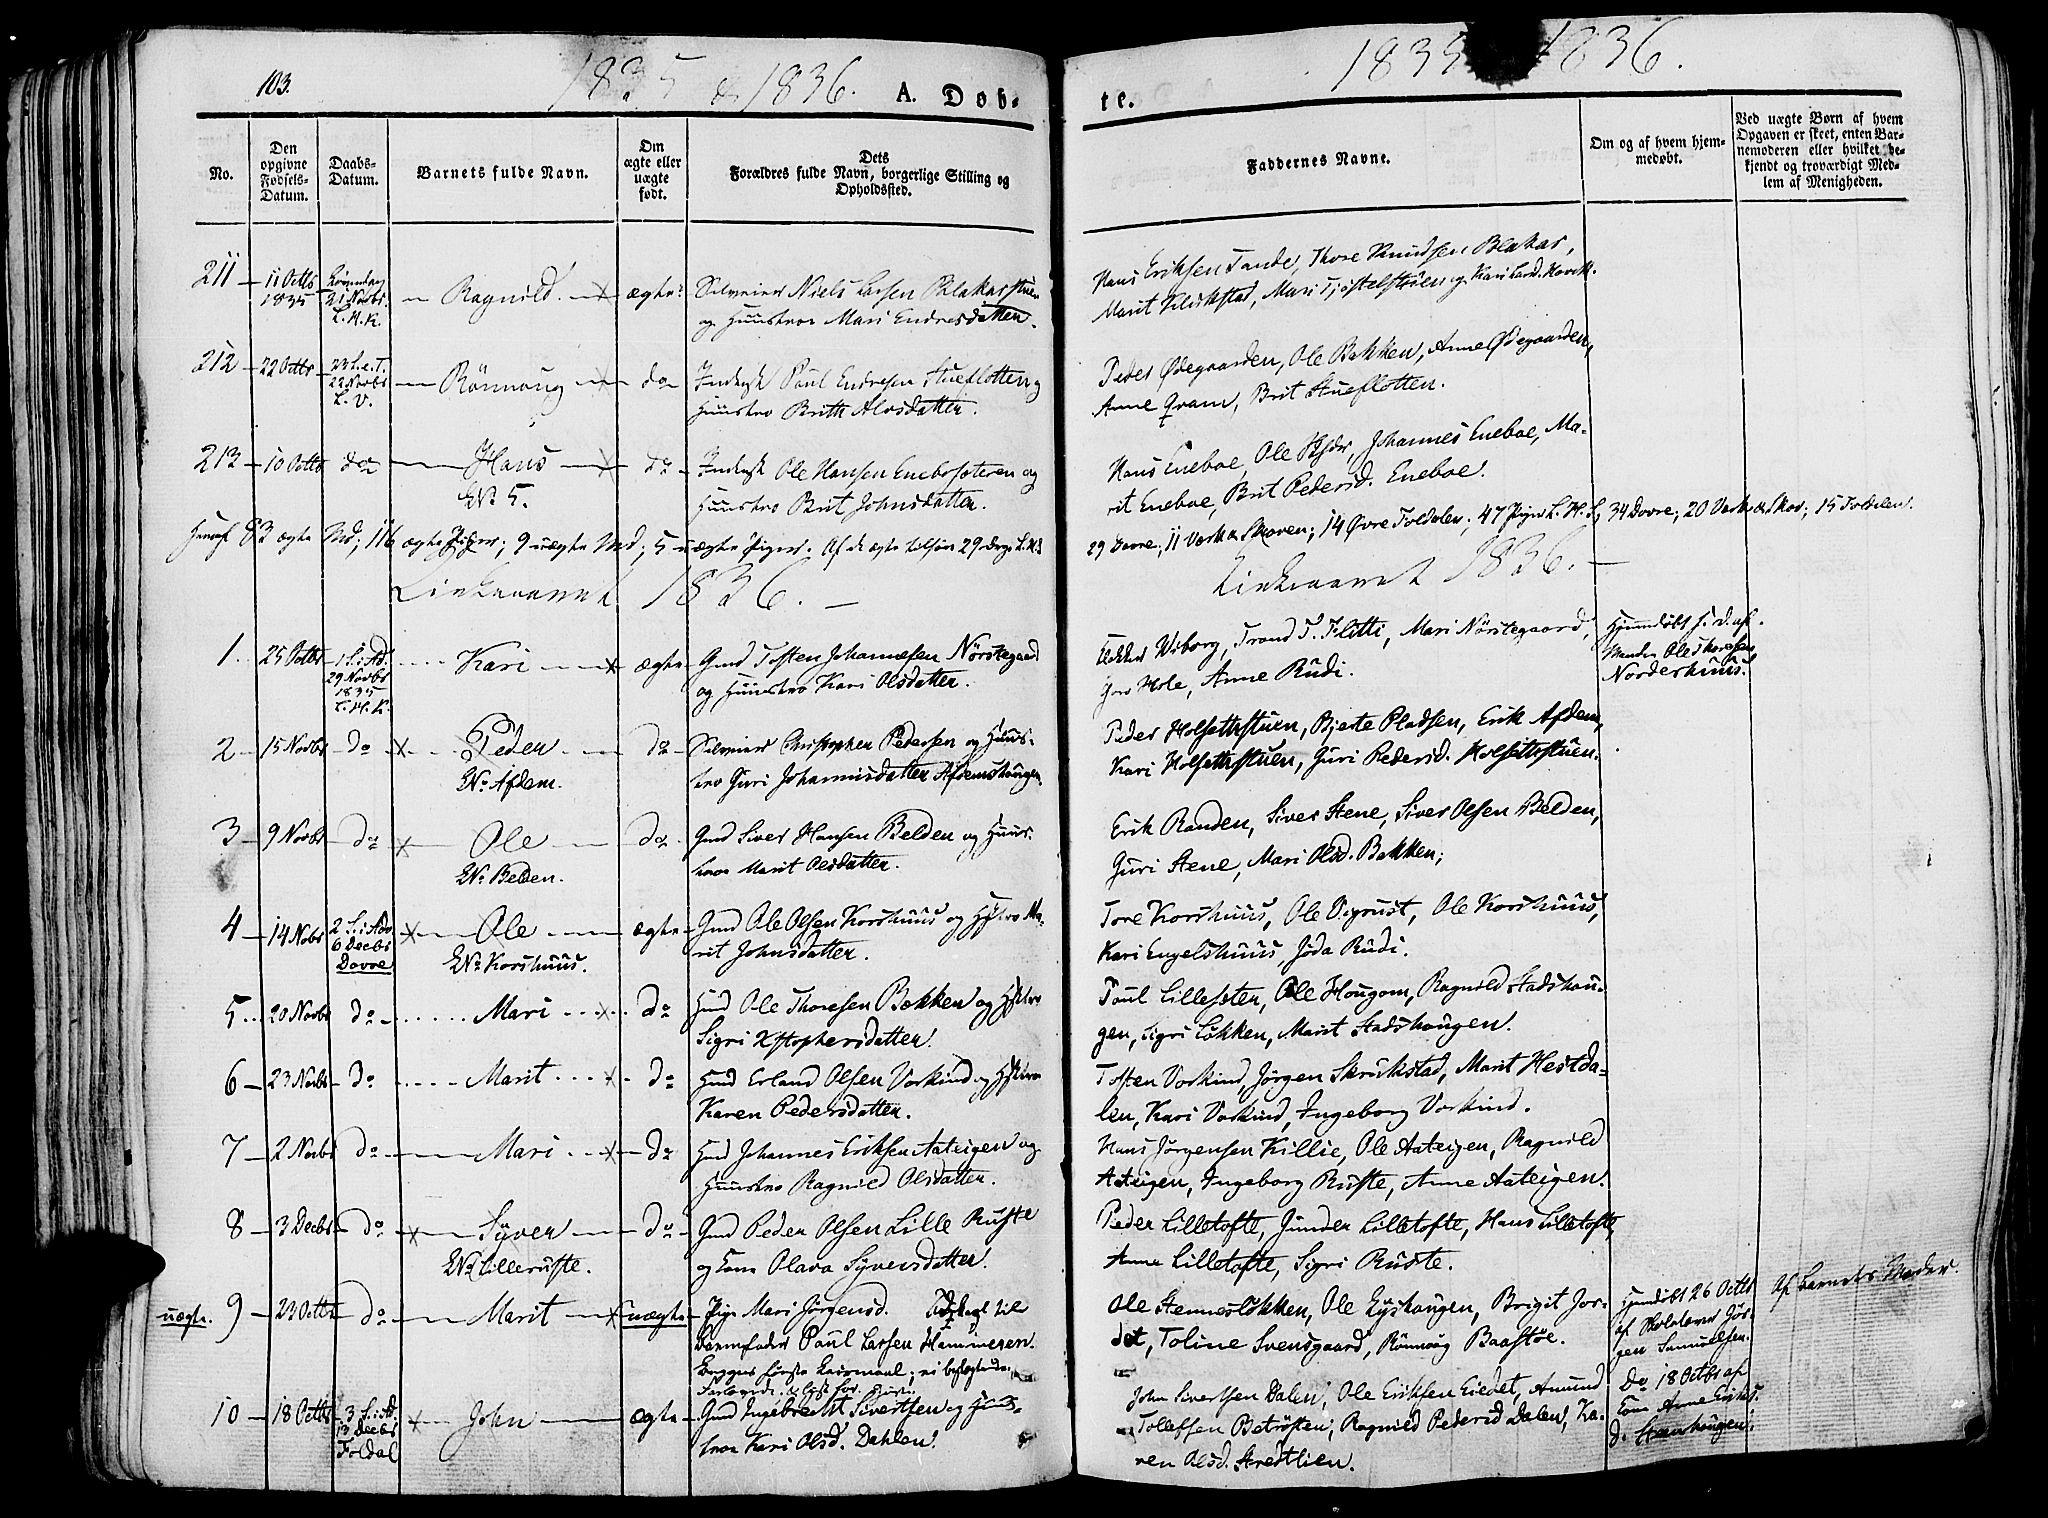 SAH, Lesja prestekontor, Ministerialbok nr. 5, 1830-1842, s. 103